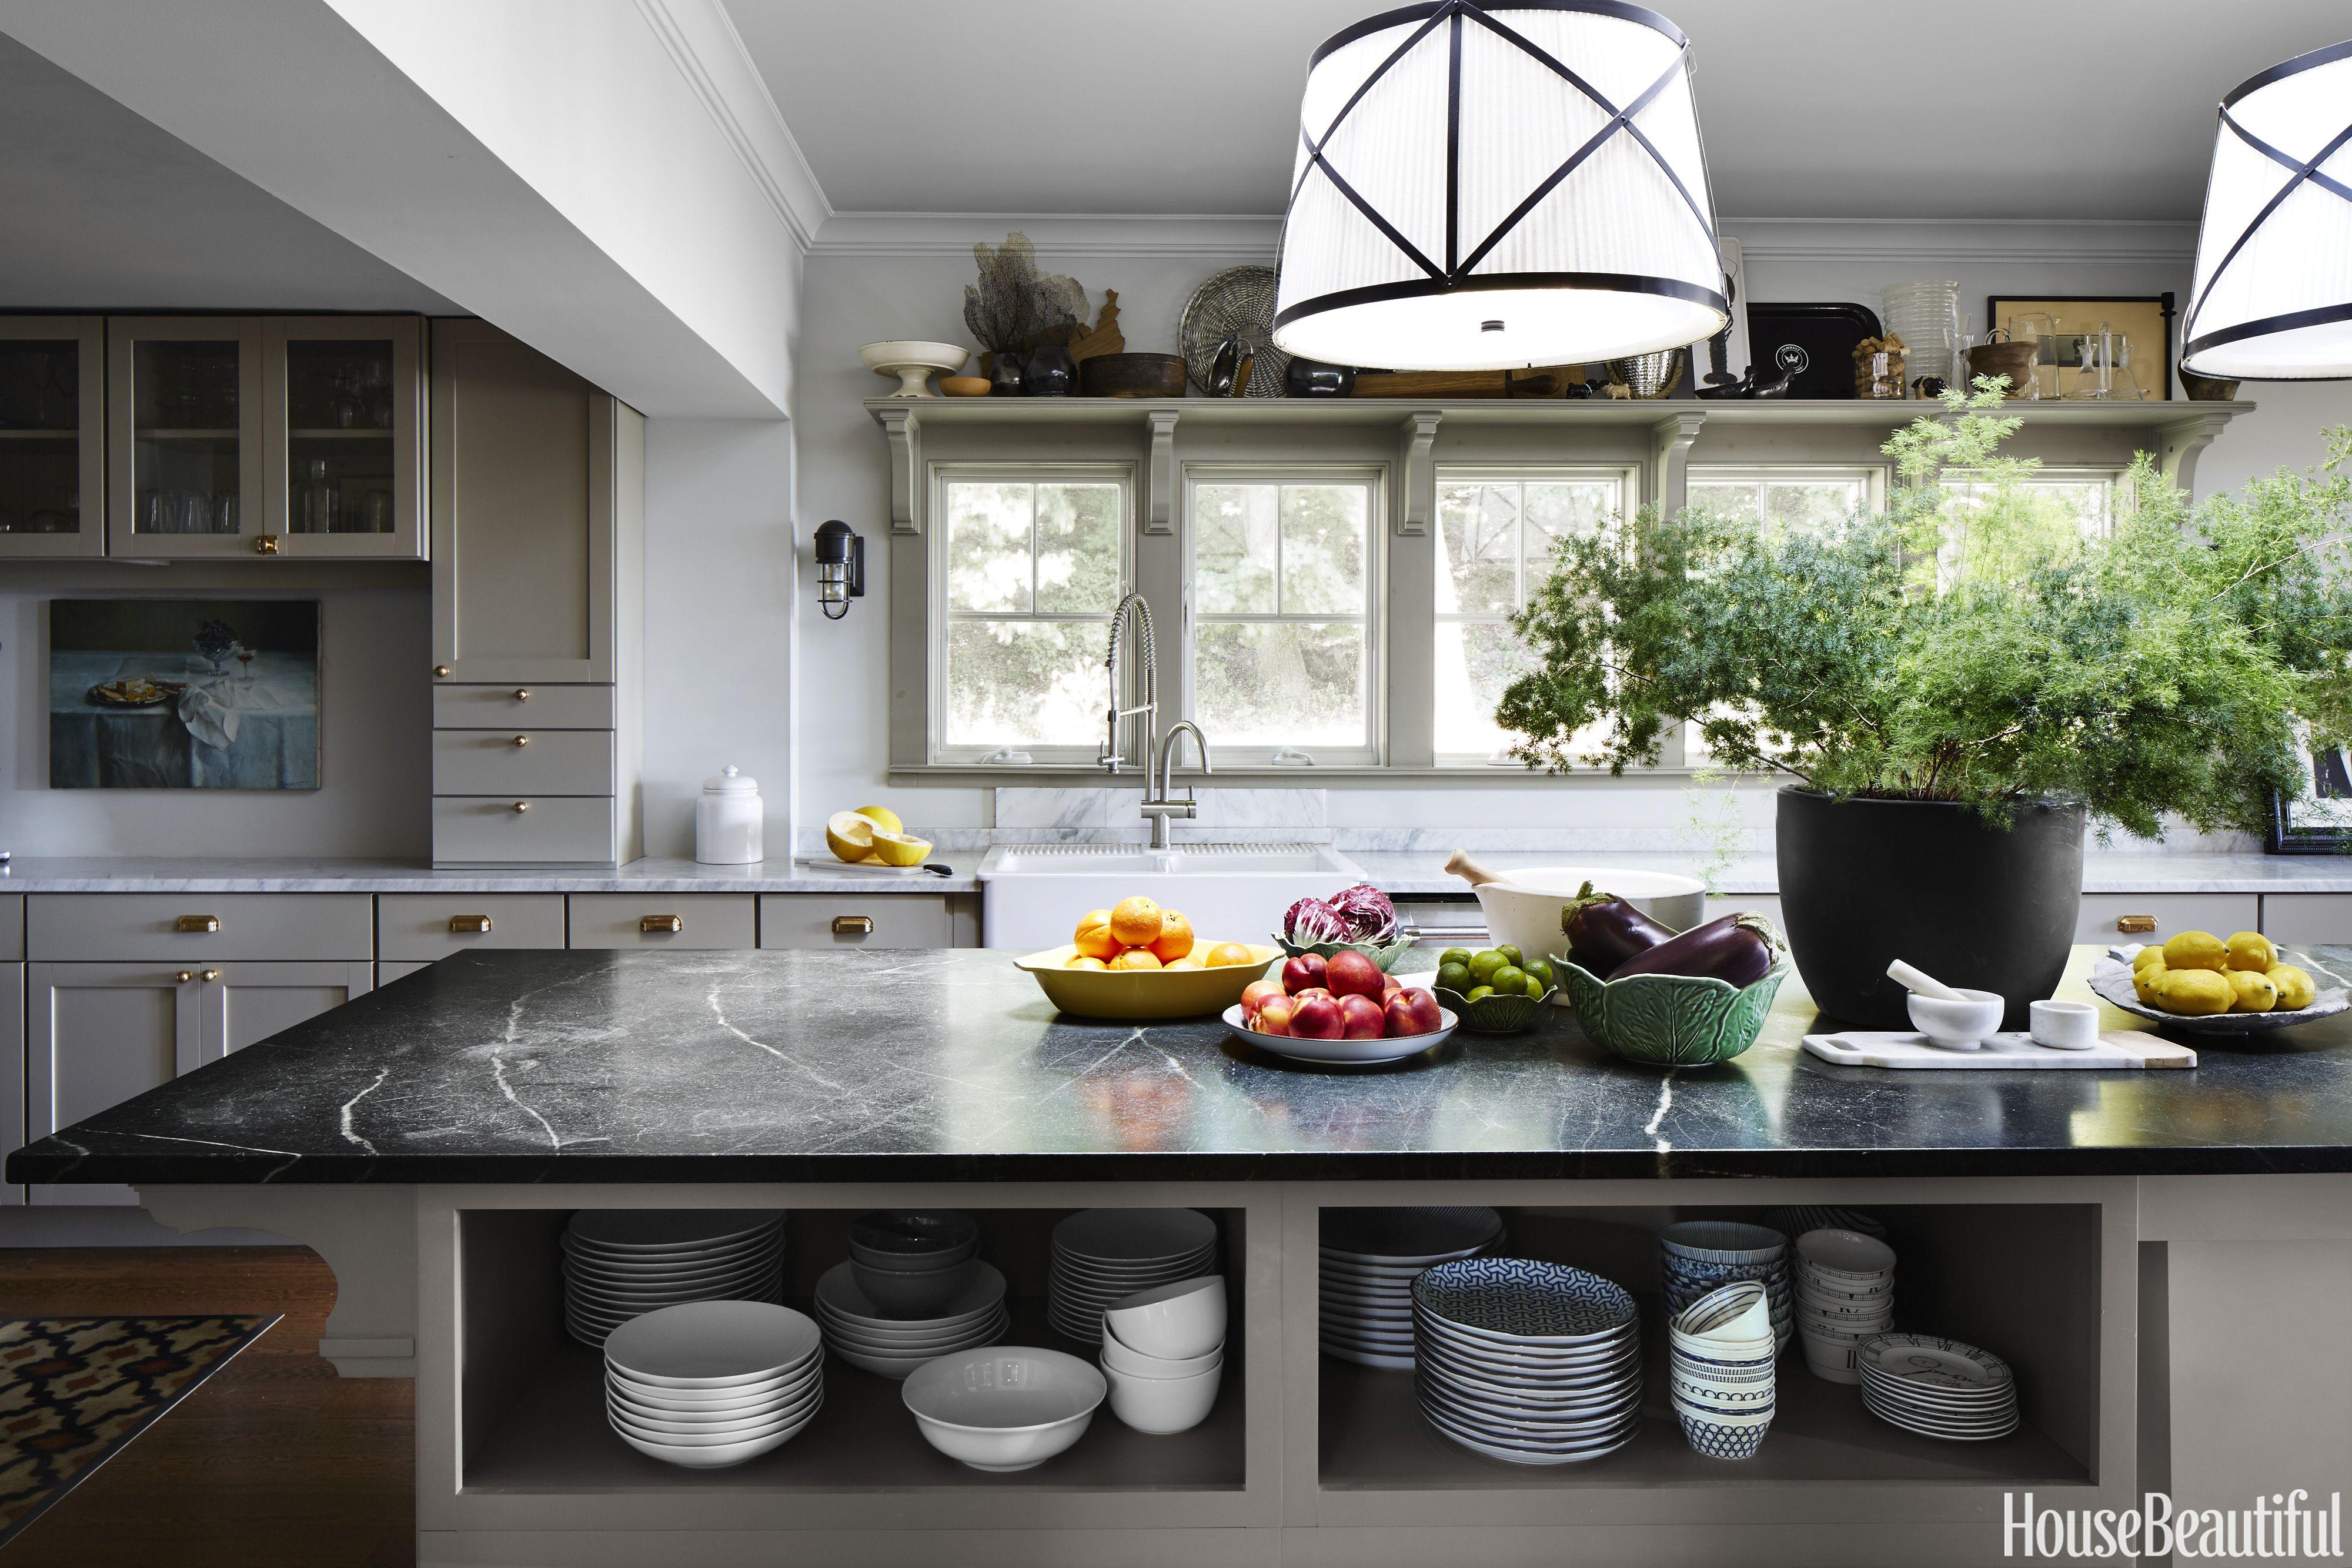 24 unique kitchen storage ideas easy storage solutions for kitchens rh housebeautiful com